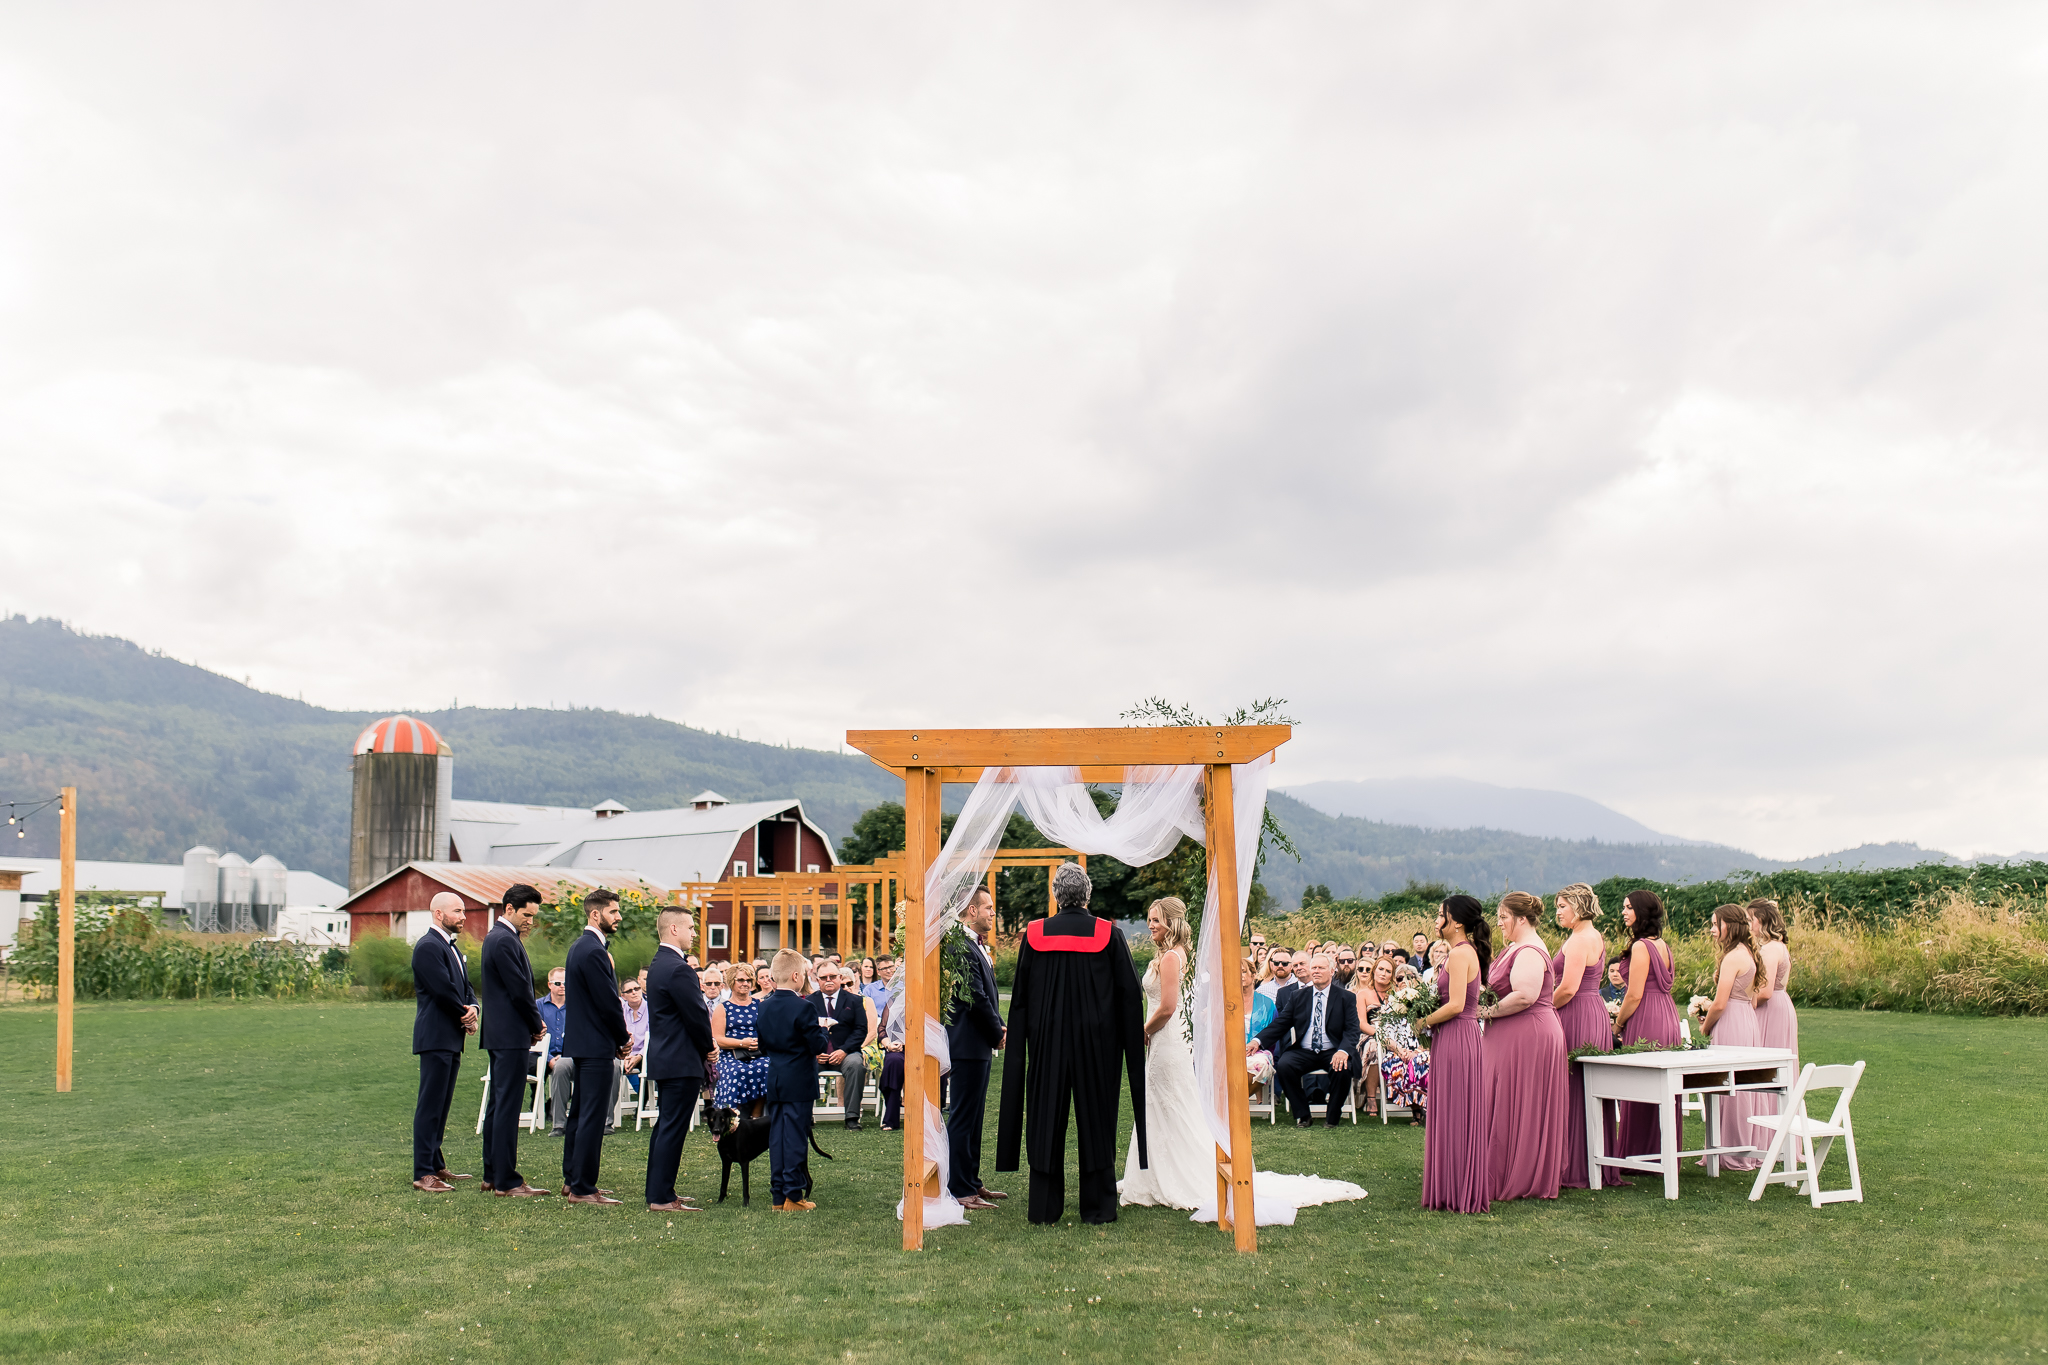 Saar Bank Farm Wedding Photography in Abbotsford - Stef ...